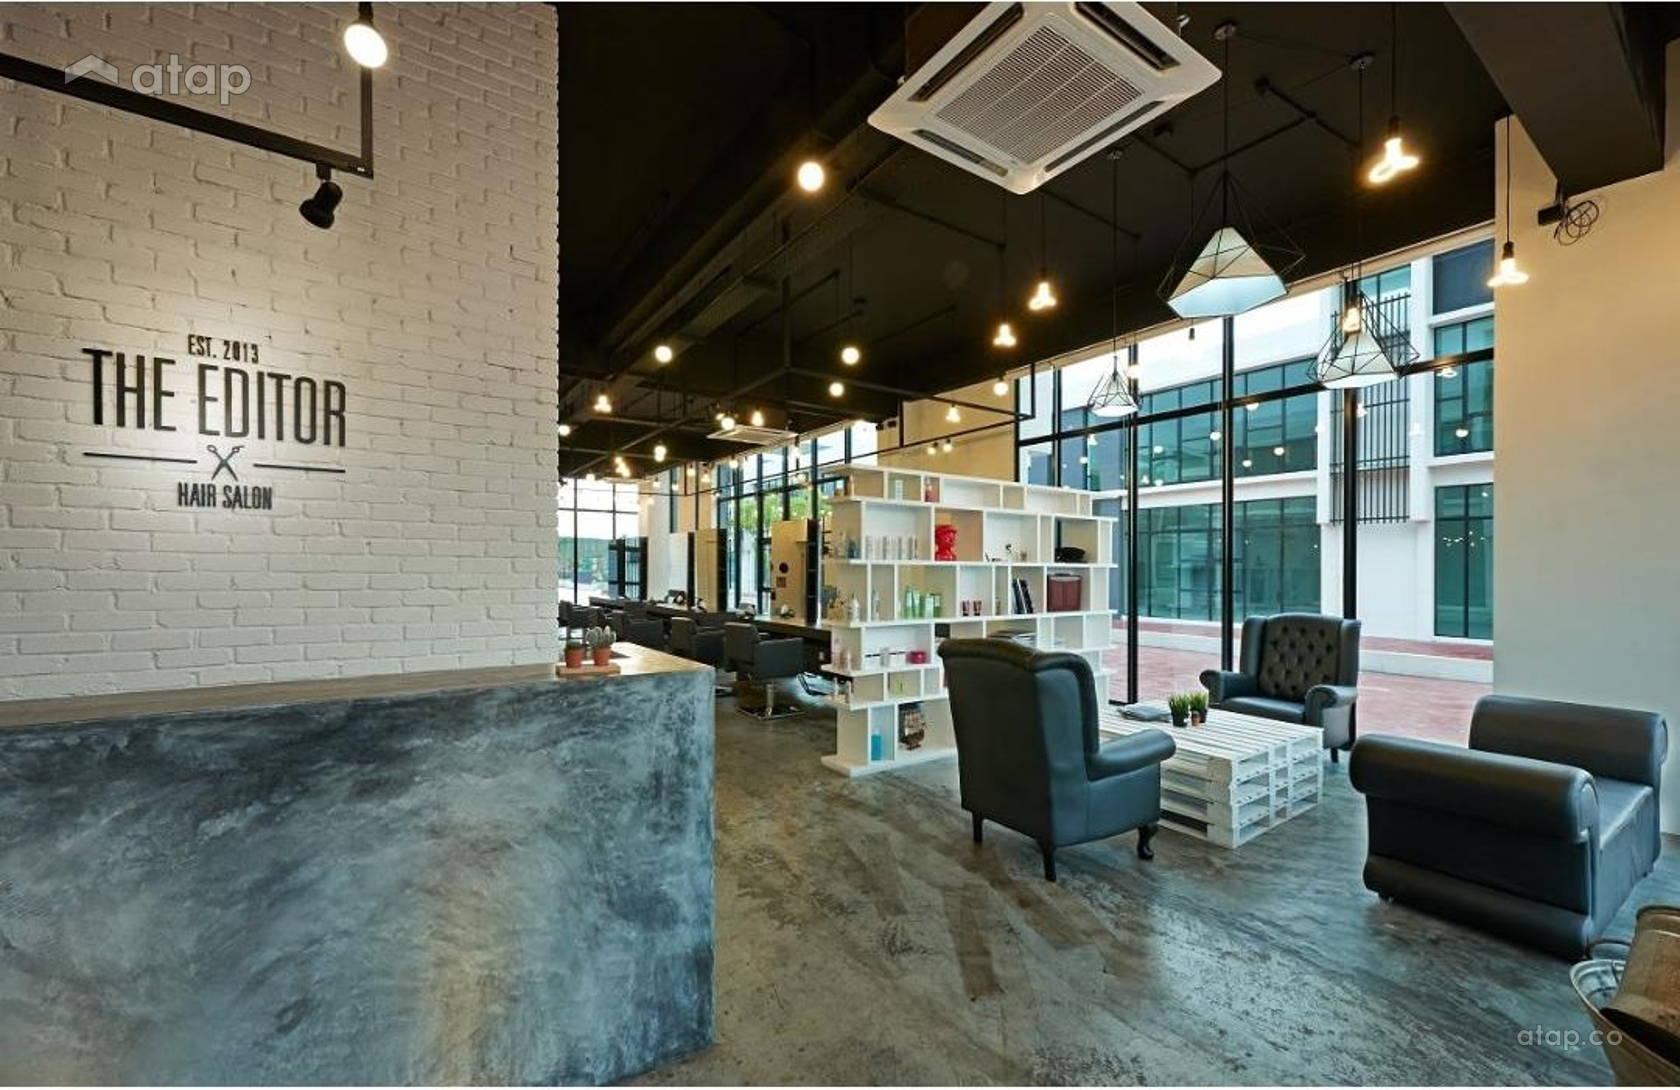 The Editor Hair Salon Ground Floor Interior Design Renovation Ideas ...